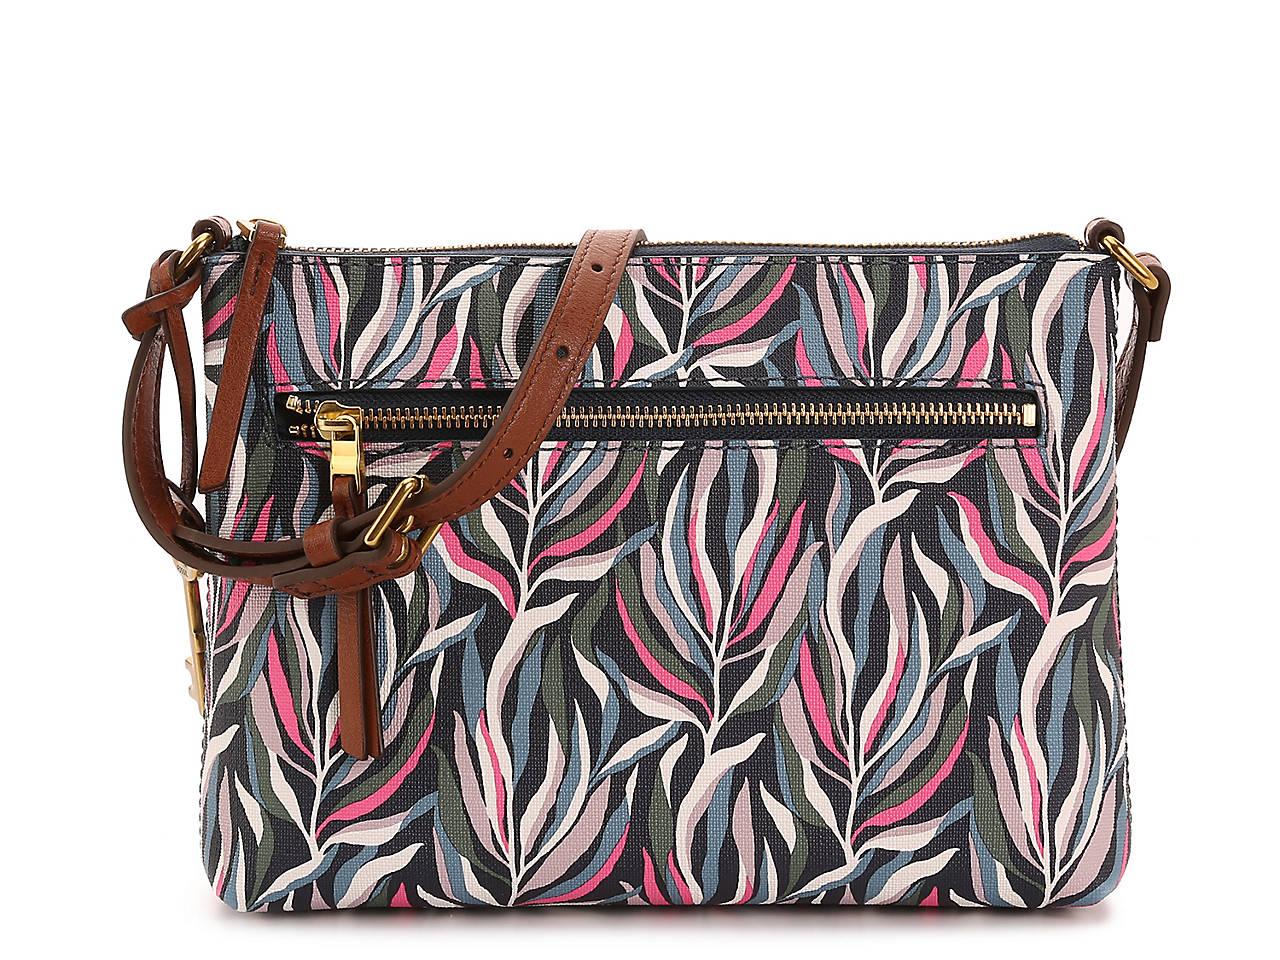 3f3d82c45a Fossil Fiona Small Crossbody Bag Women s Handbags   Accessories